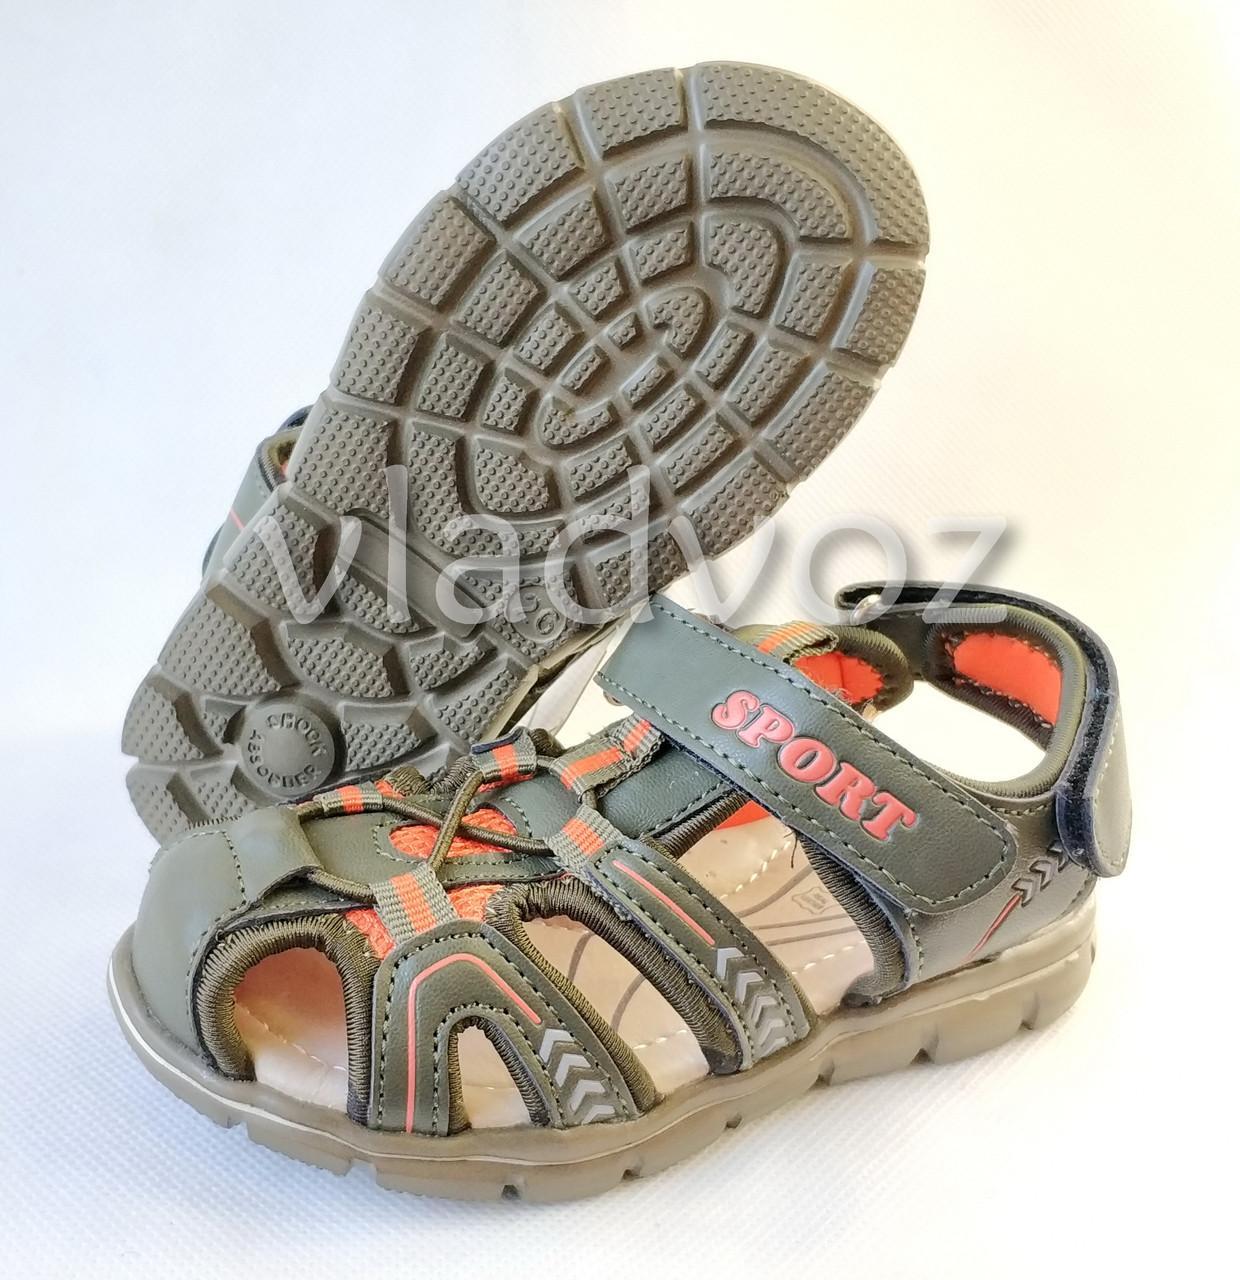 Босоножки сандалии для мальчика на мальчиков мальчику Tom.M хаки Спорт